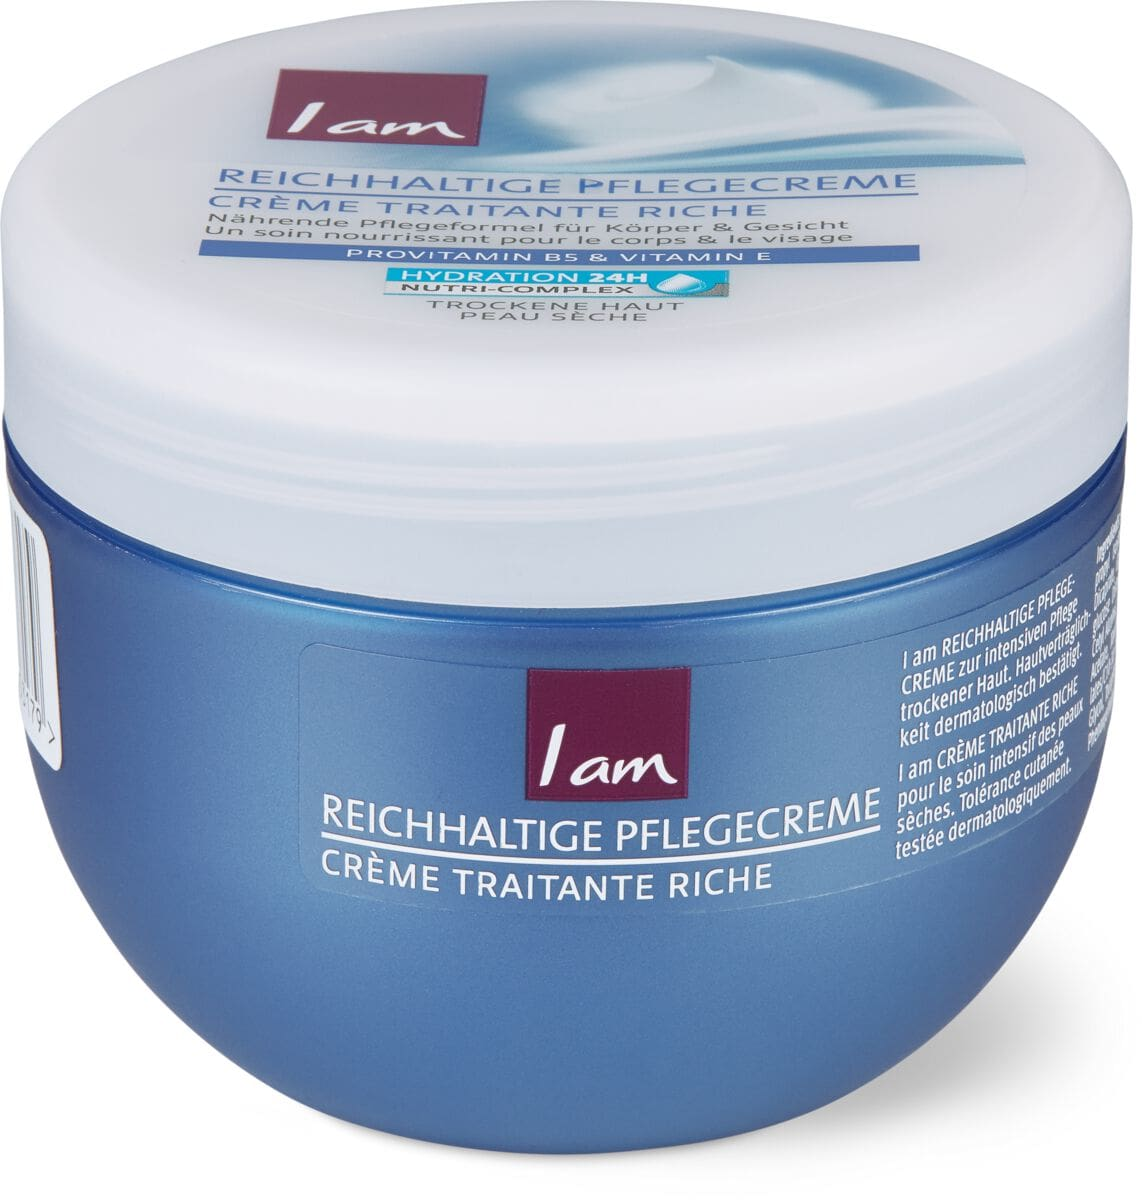 I am Crème Traitante riche